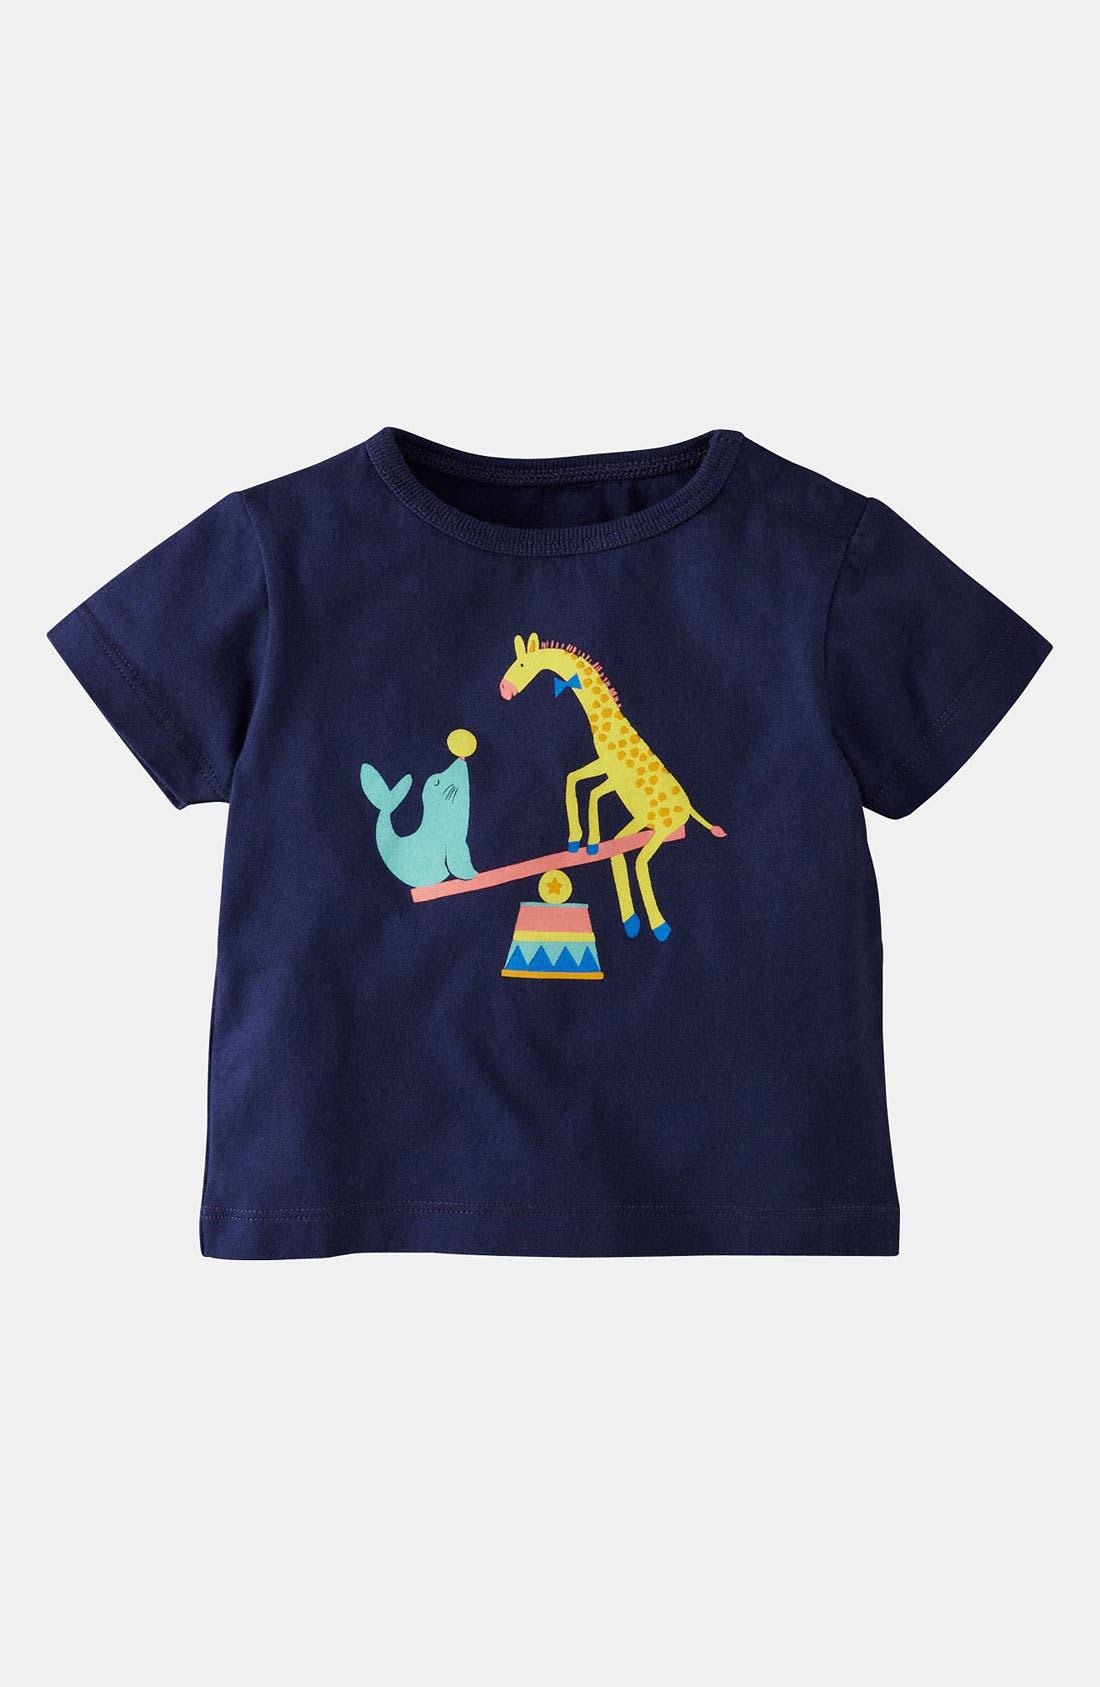 Main Image - Mini Boden 'Circus Animal' T-Shirt (Baby)